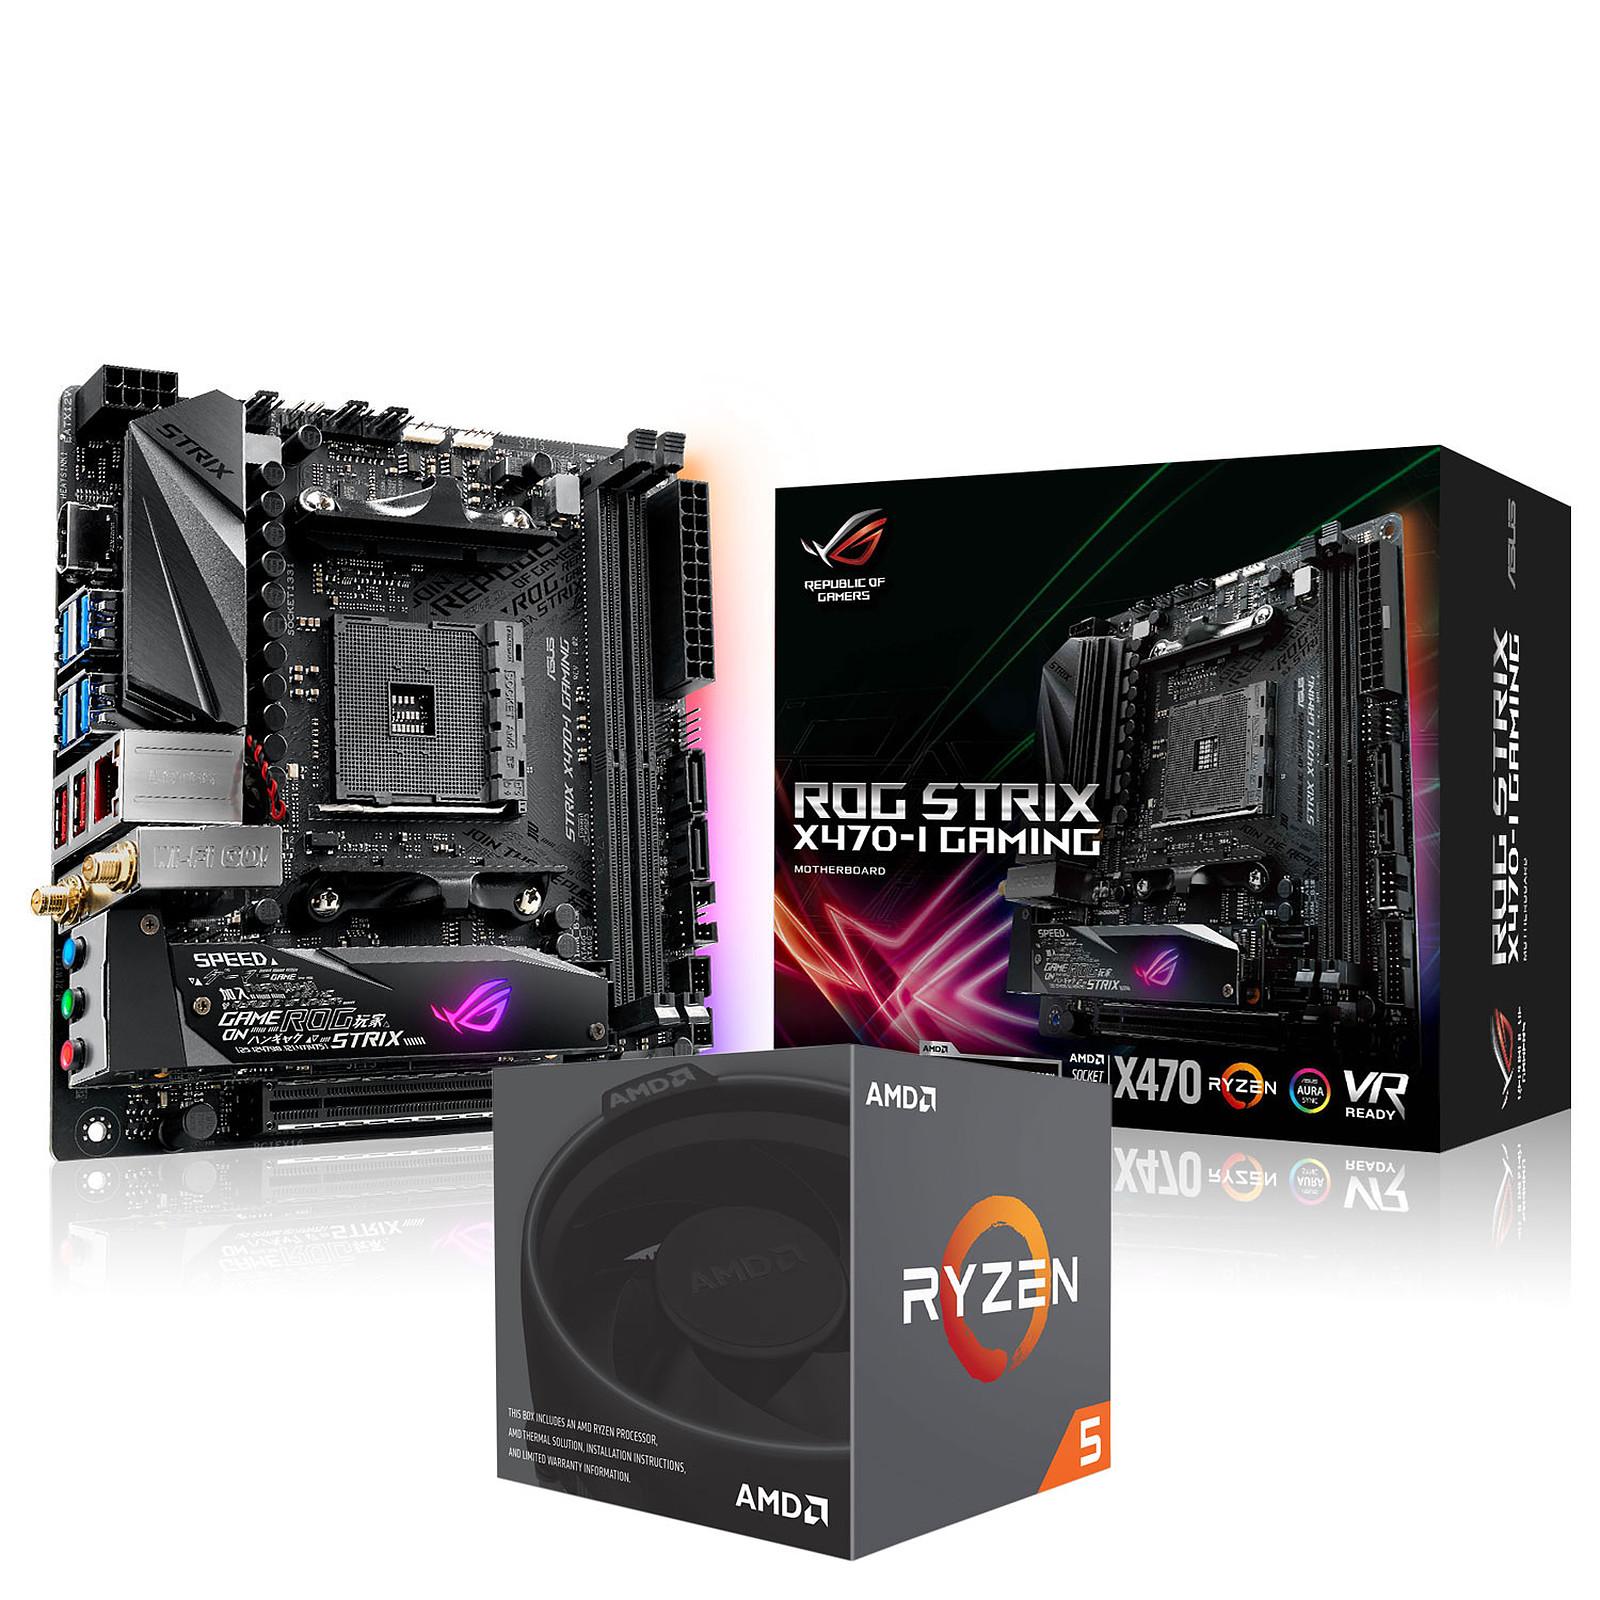 ASUS ROG STRIX X470-I GAMING + AMD Ryzen 5 2600